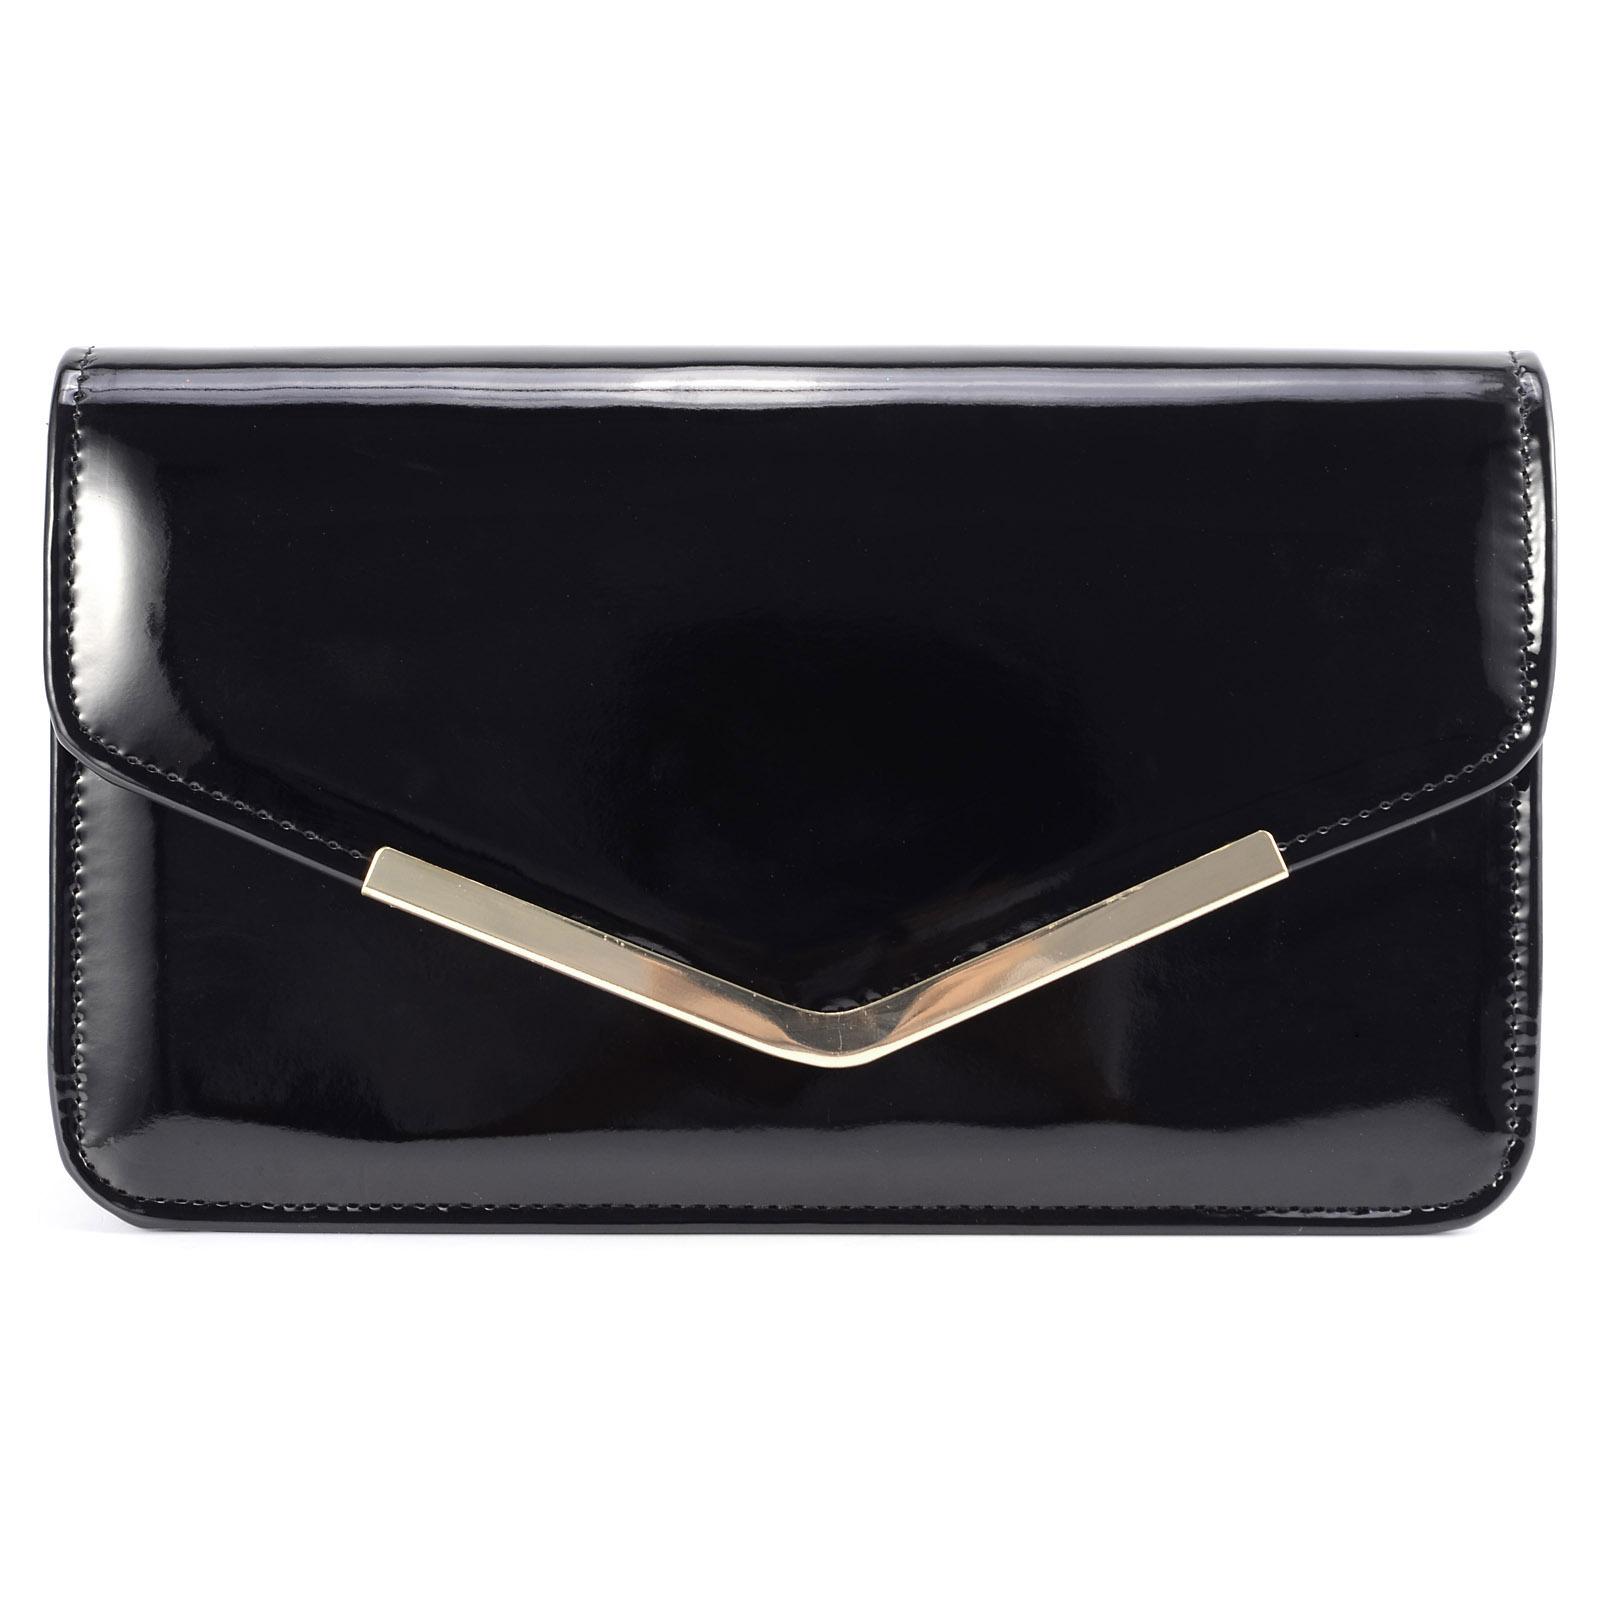 Enveloppe pochette embrayage sac main epaule cha ne - Pochette rangement pour sac a main ...